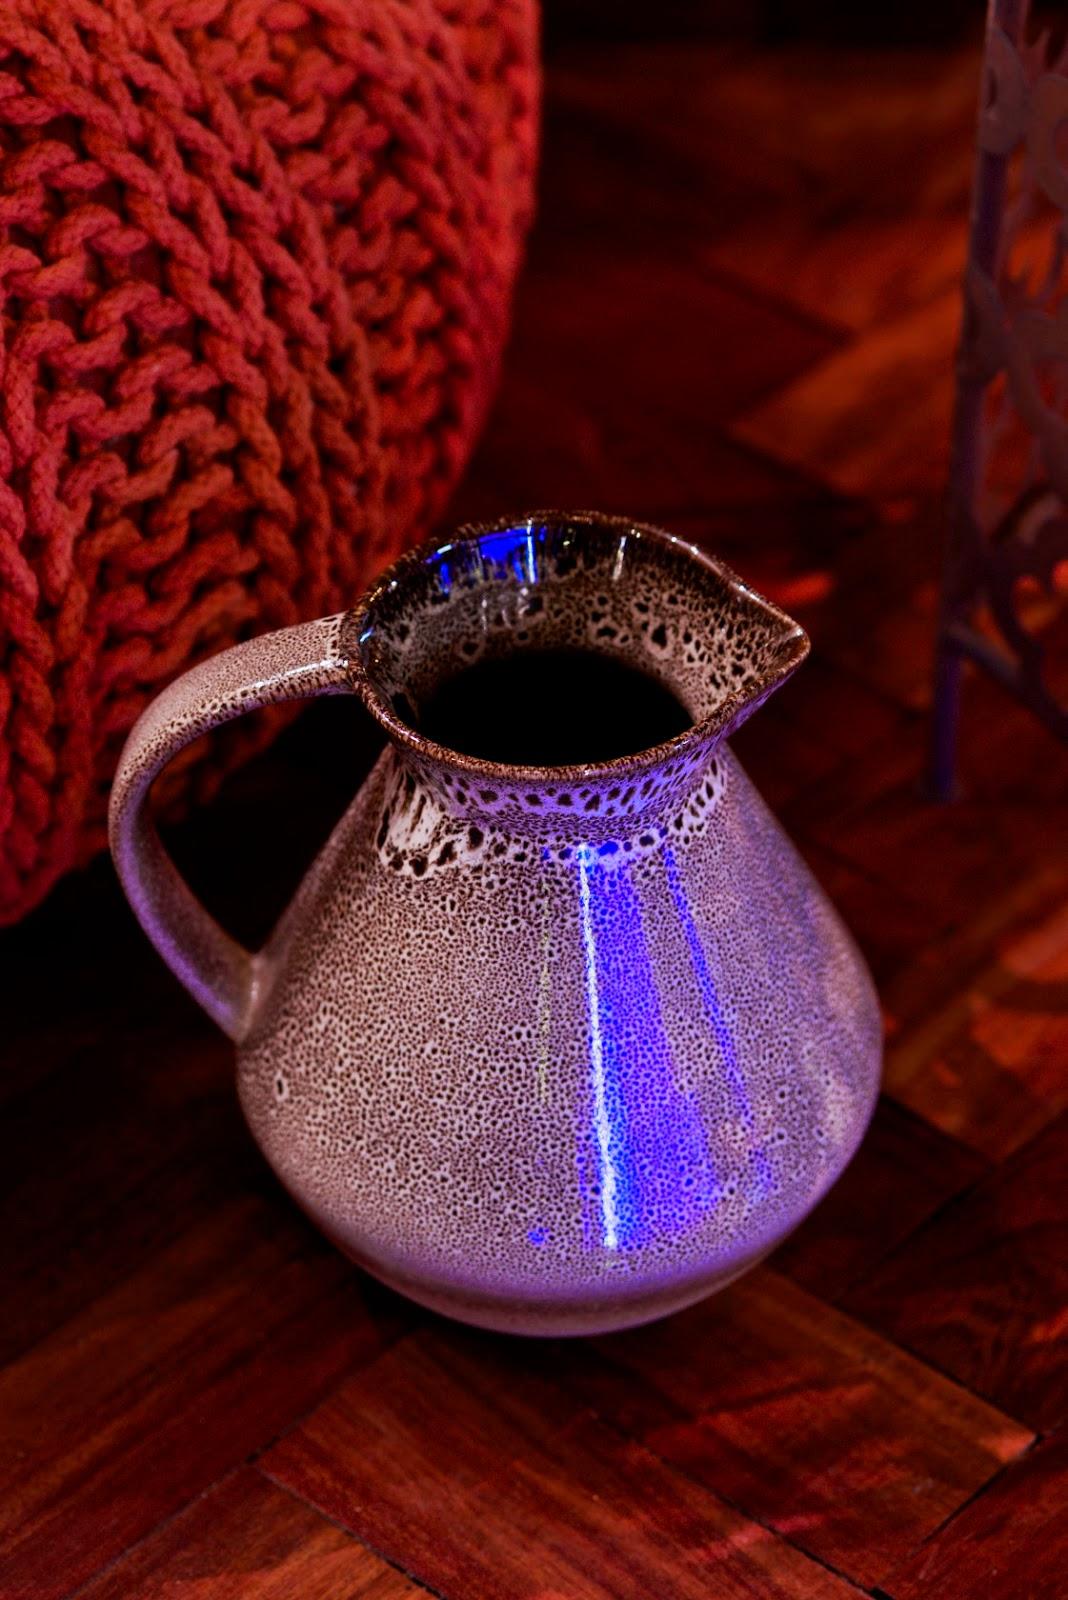 autumn/winter jug from next